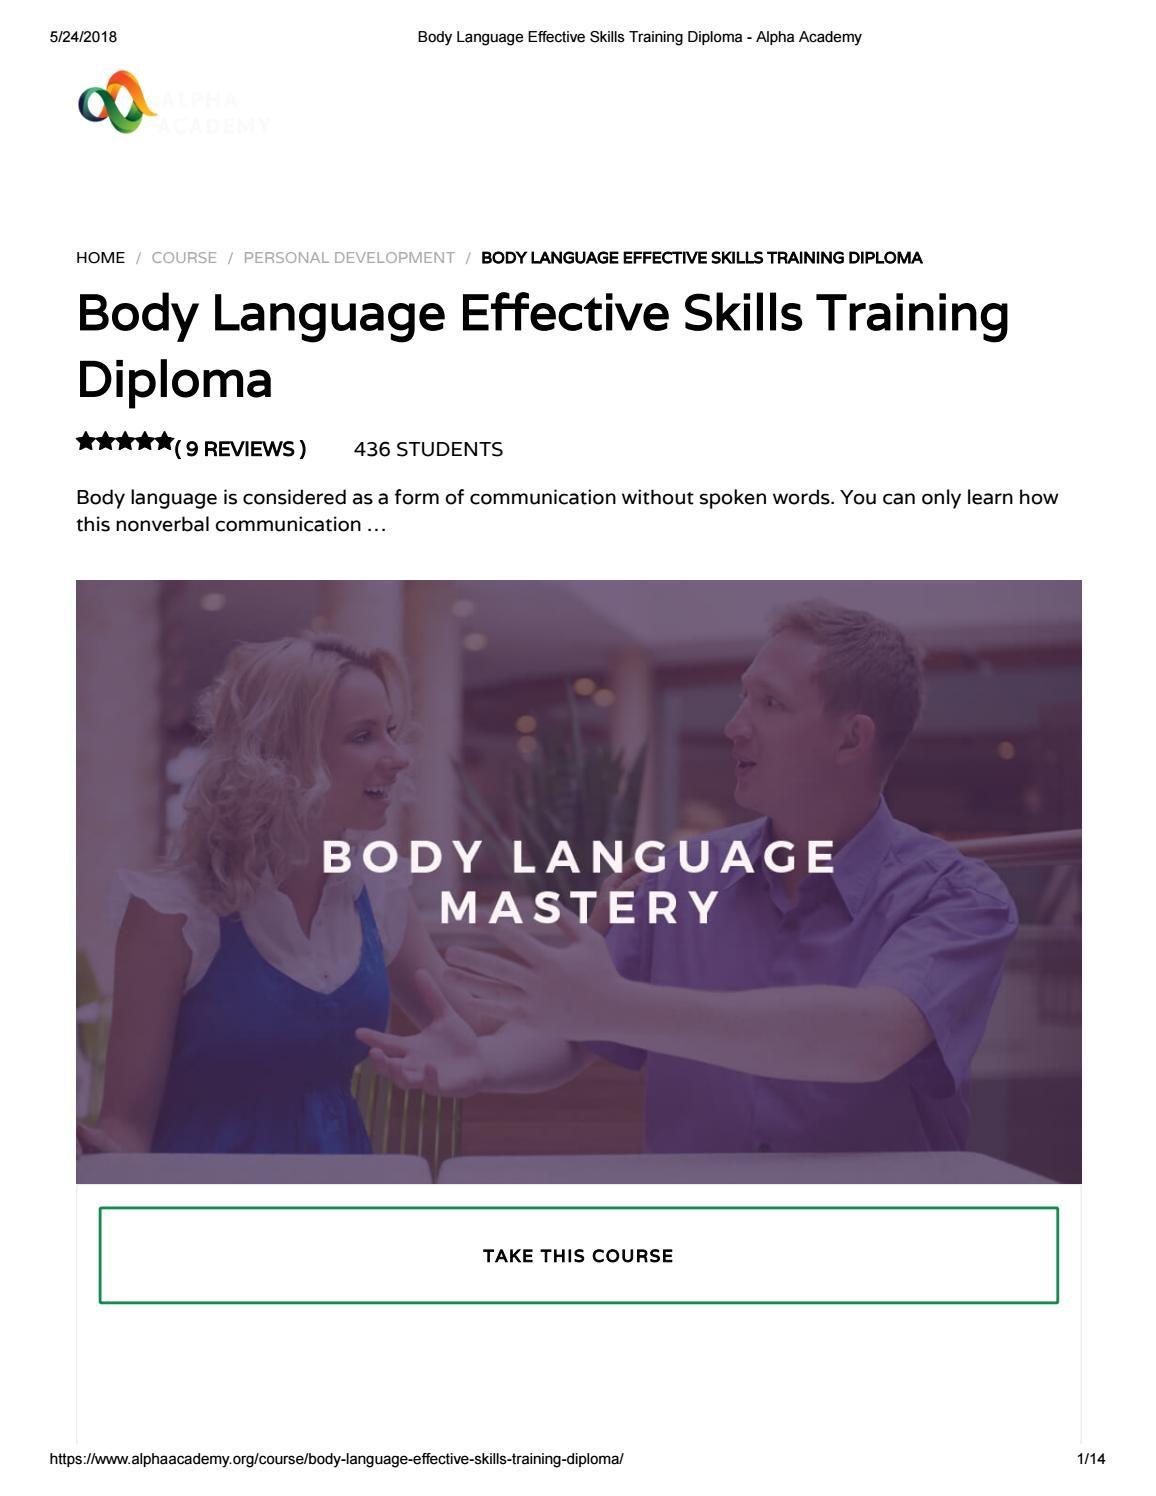 Body Language Effective Skills Training Diploma